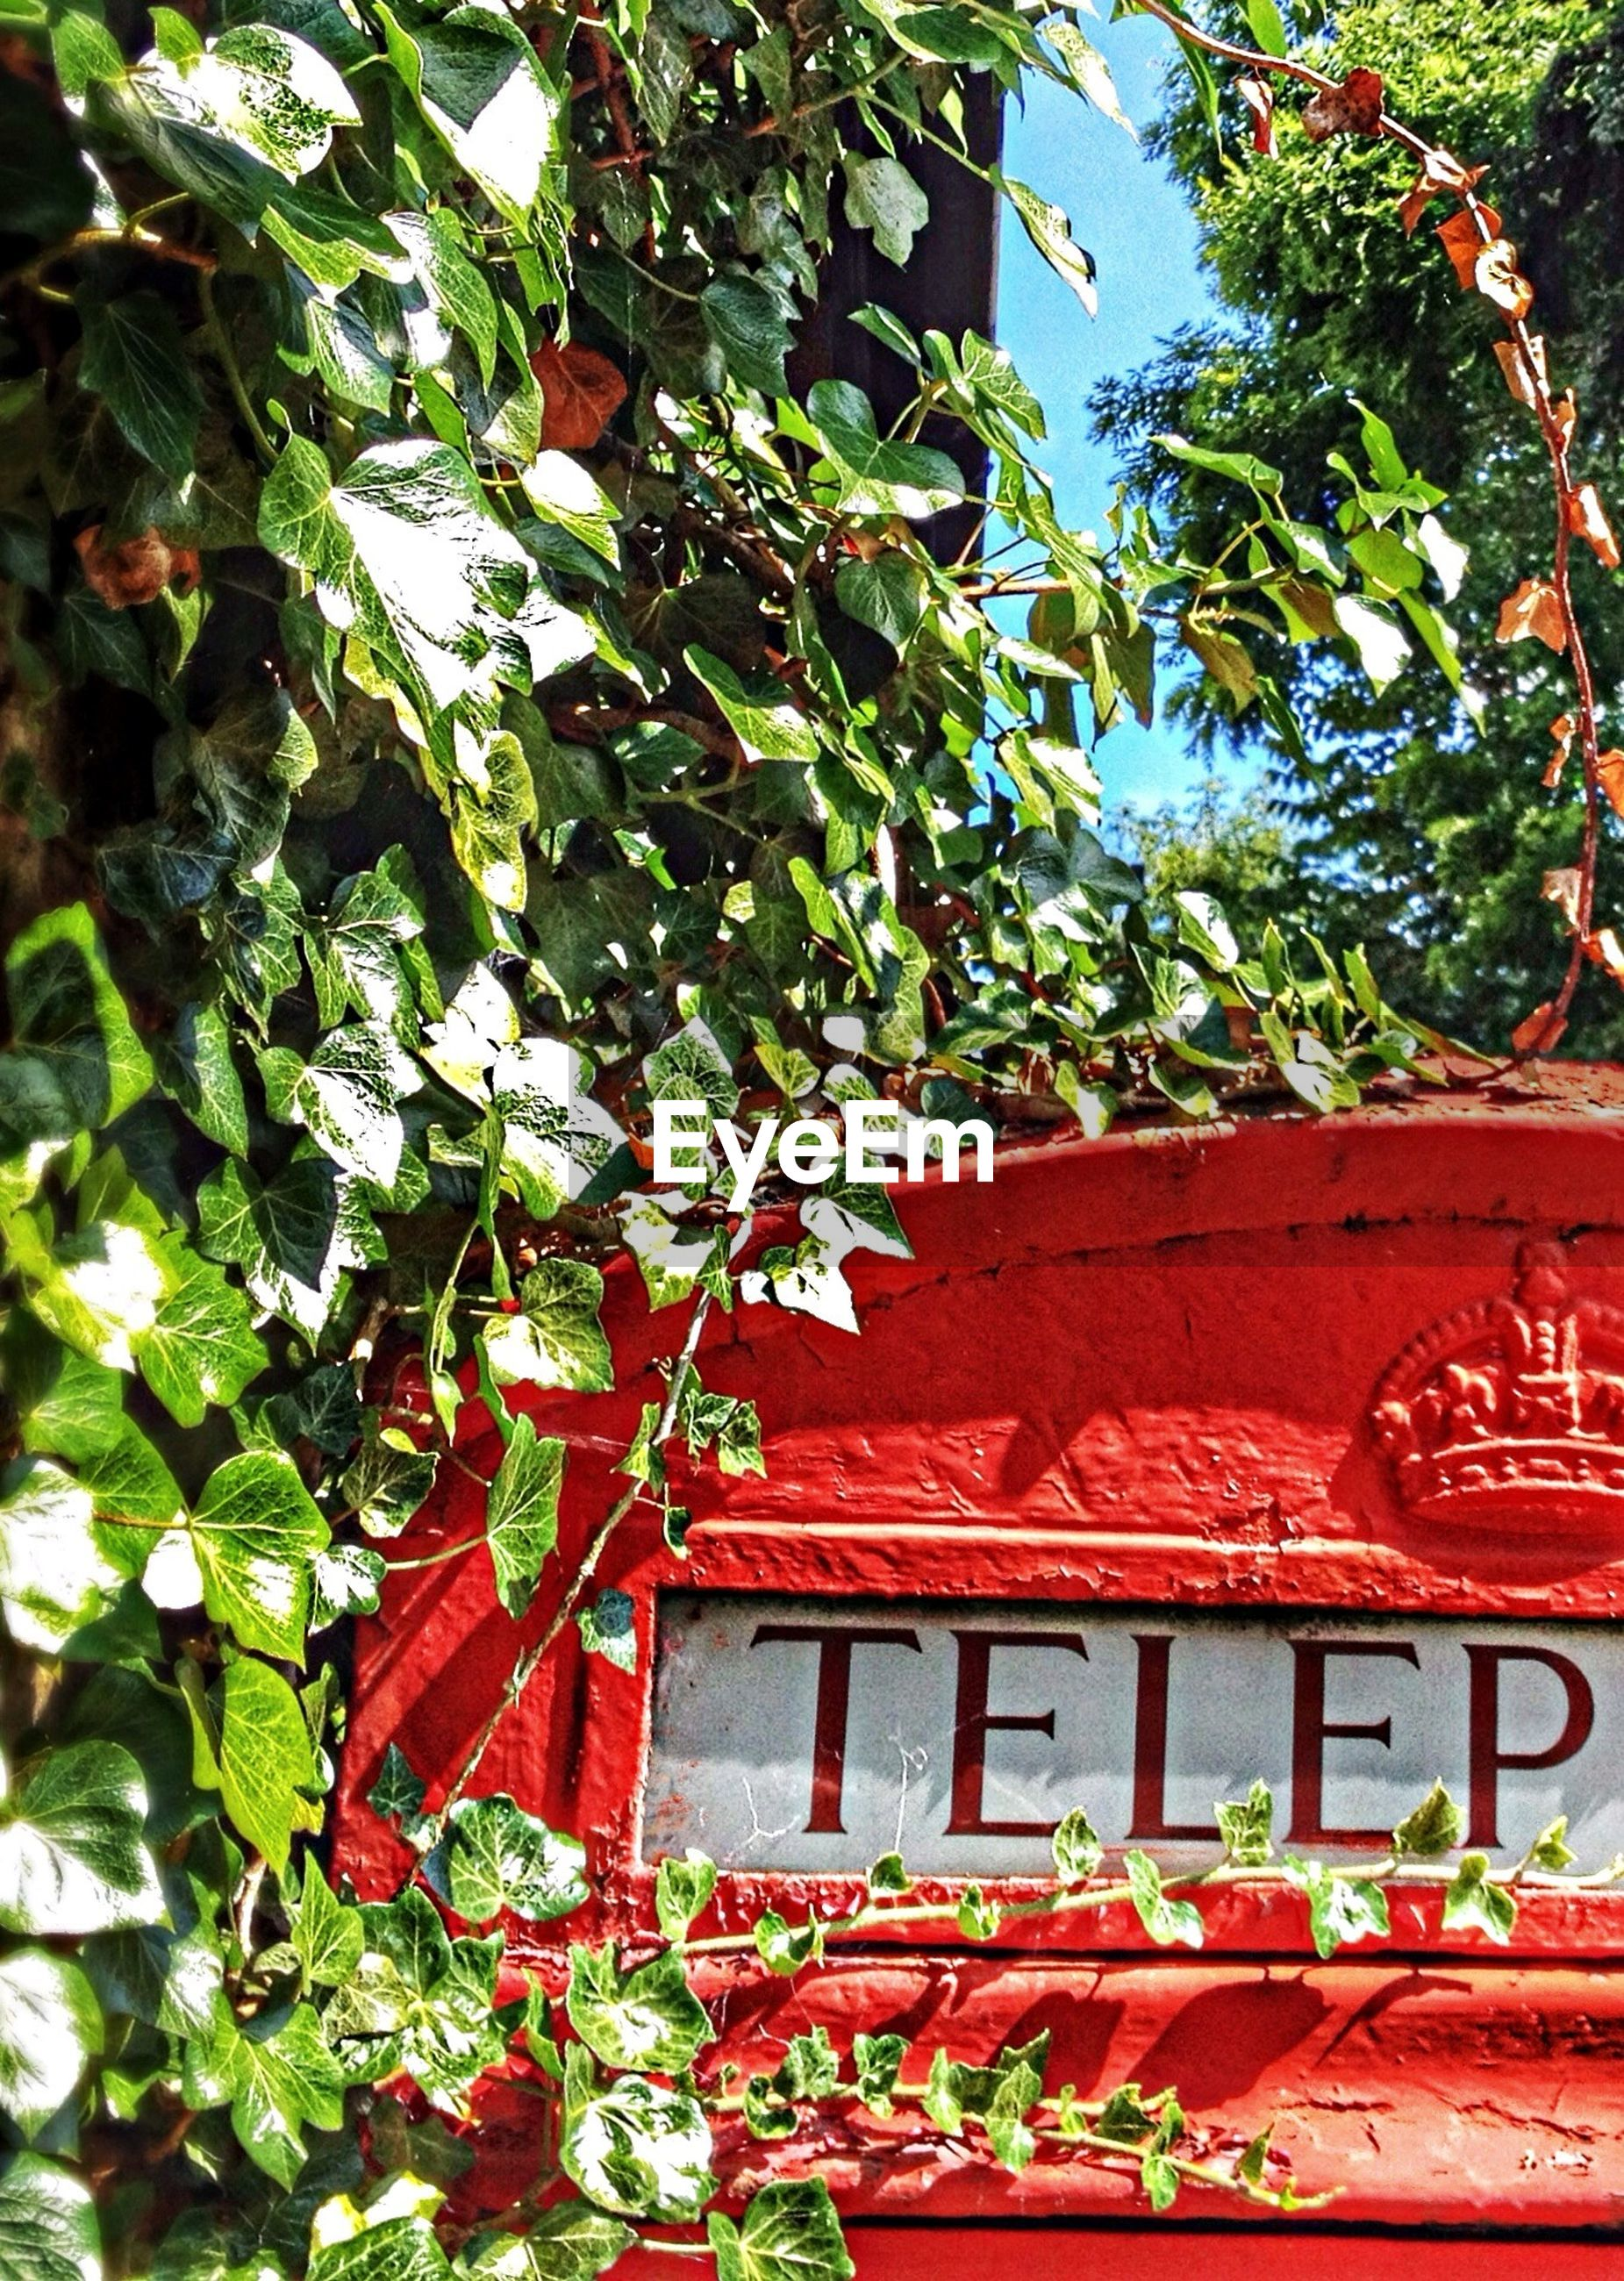 Western script written on telephone booth in park